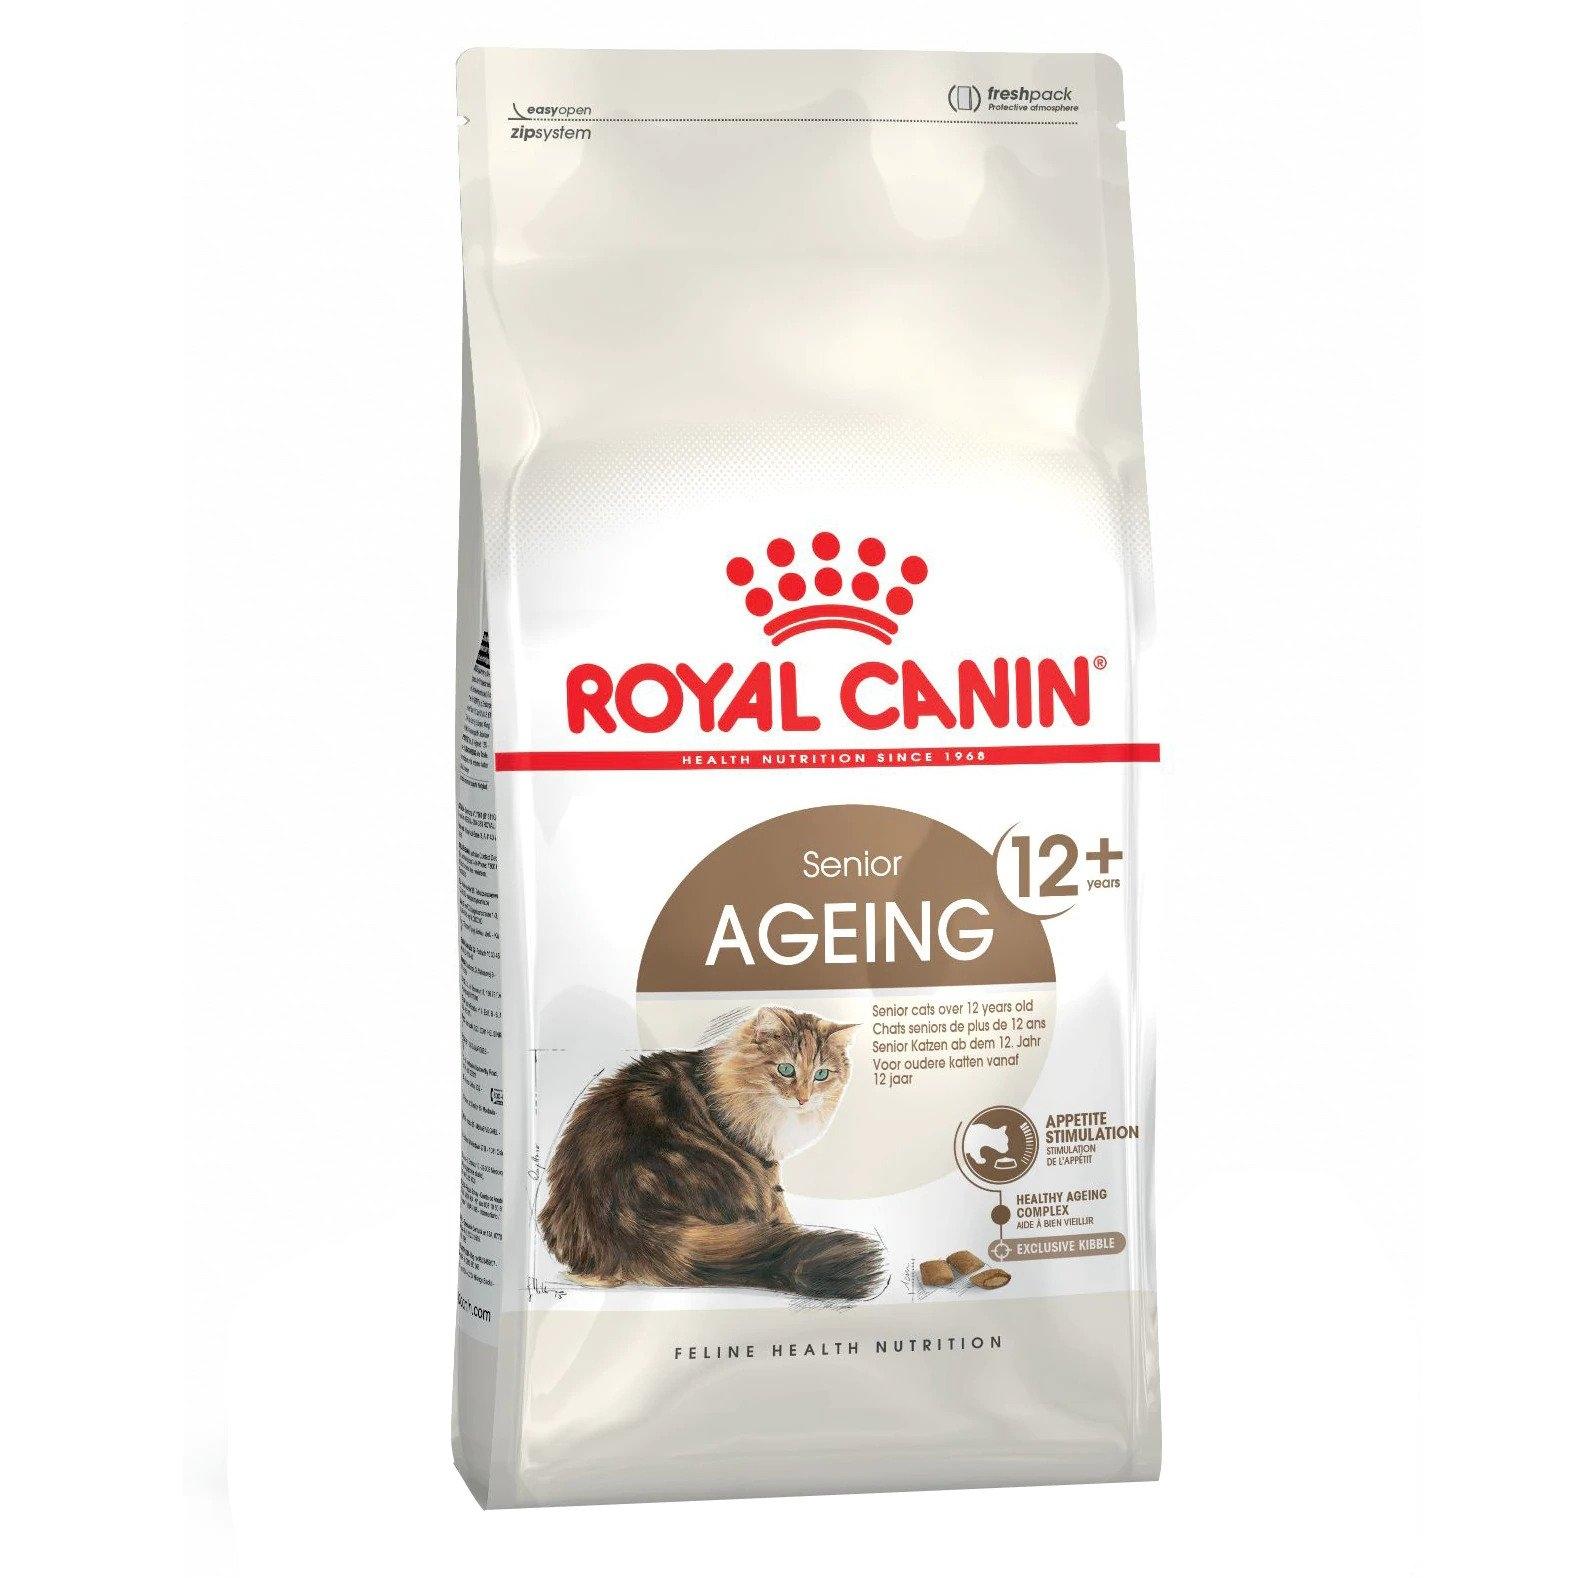 https://d2ac76g66dj6h3.cloudfront.net/media/catalog/product/r/o/royal_canin_feline_ageing_12_ani.jpg nou